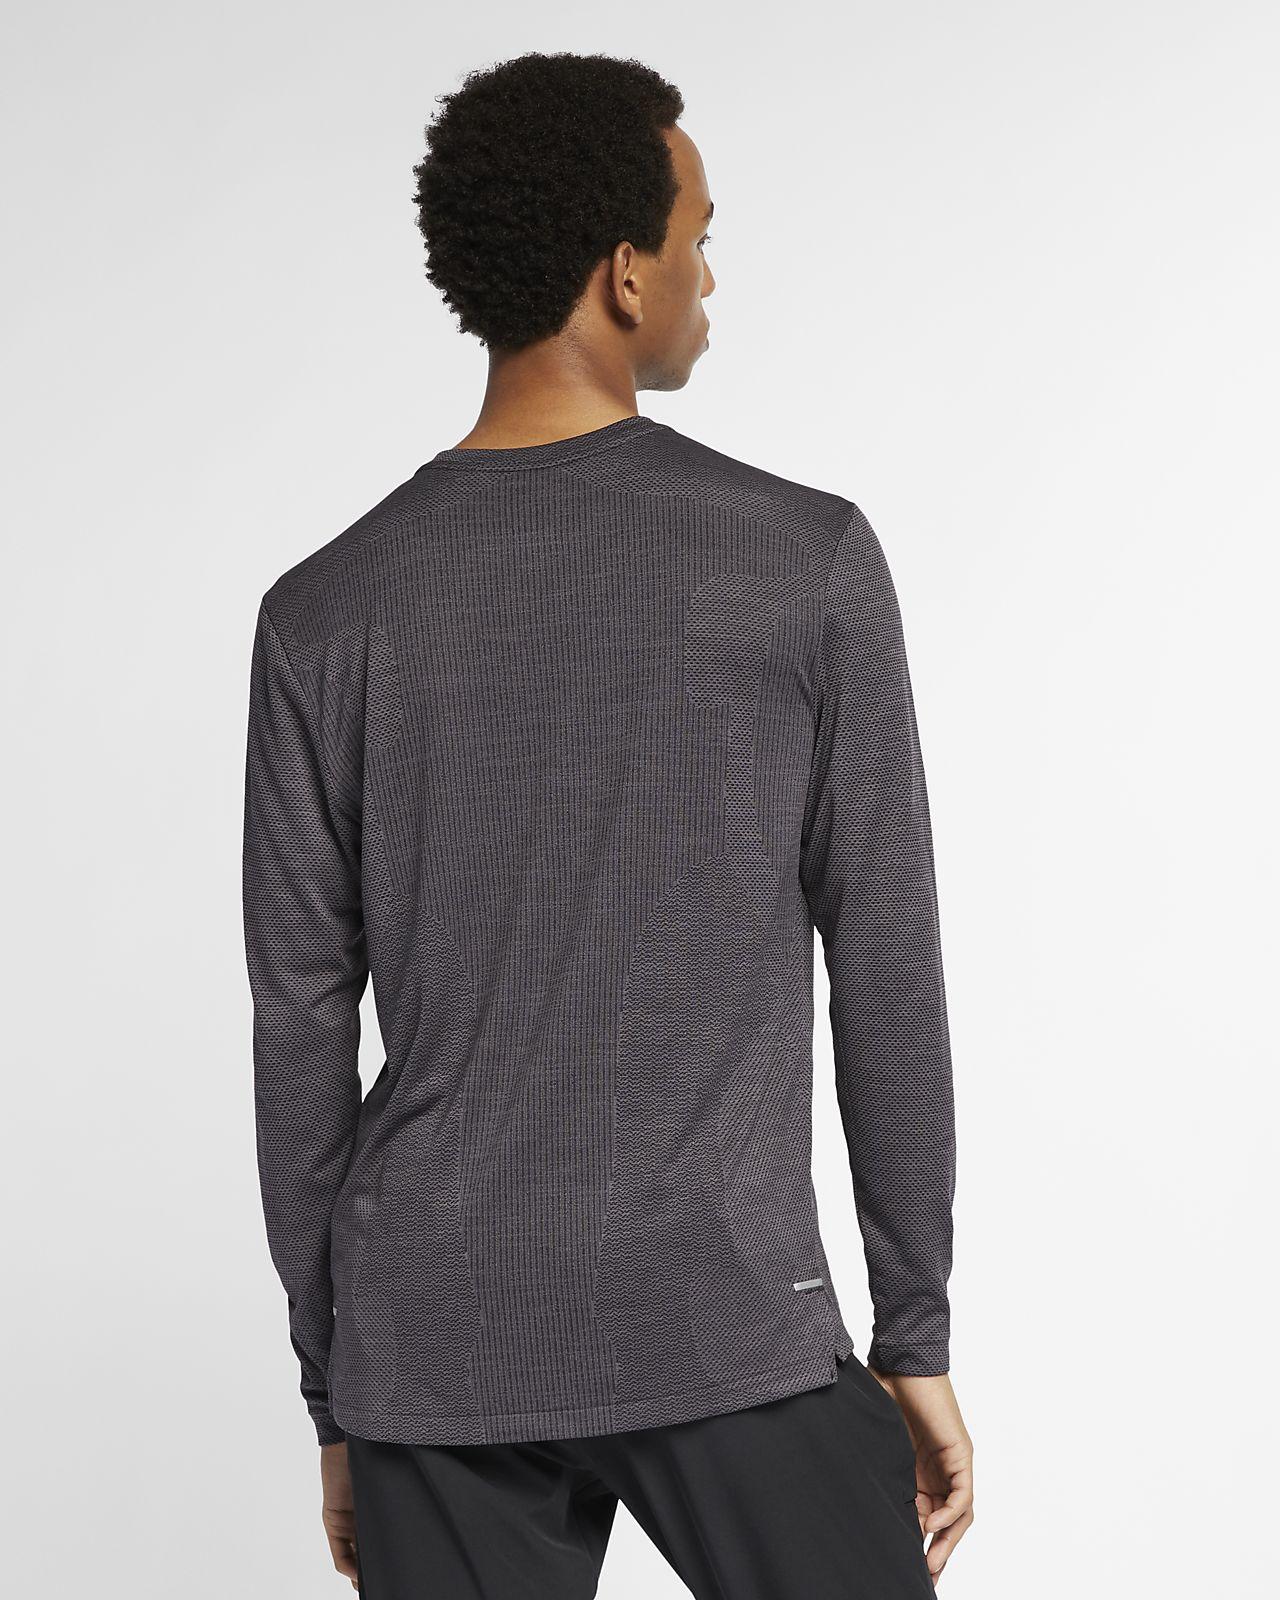 21c5fcbe Nike TechKnit Ultra Men's Long-Sleeve Running Top. Nike.com